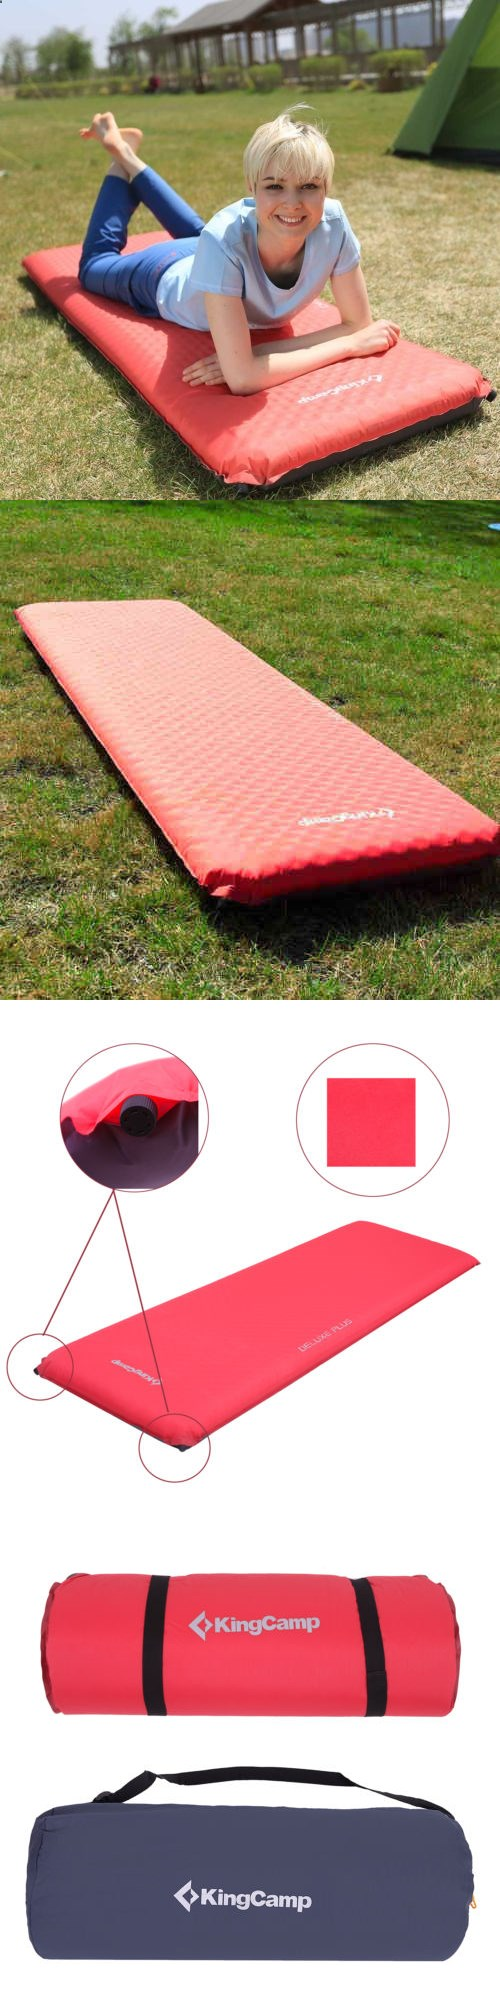 Camping Sleeping Pad - Mattresses and Pads 36114: New 4 Thick  Self-Inflating Camping